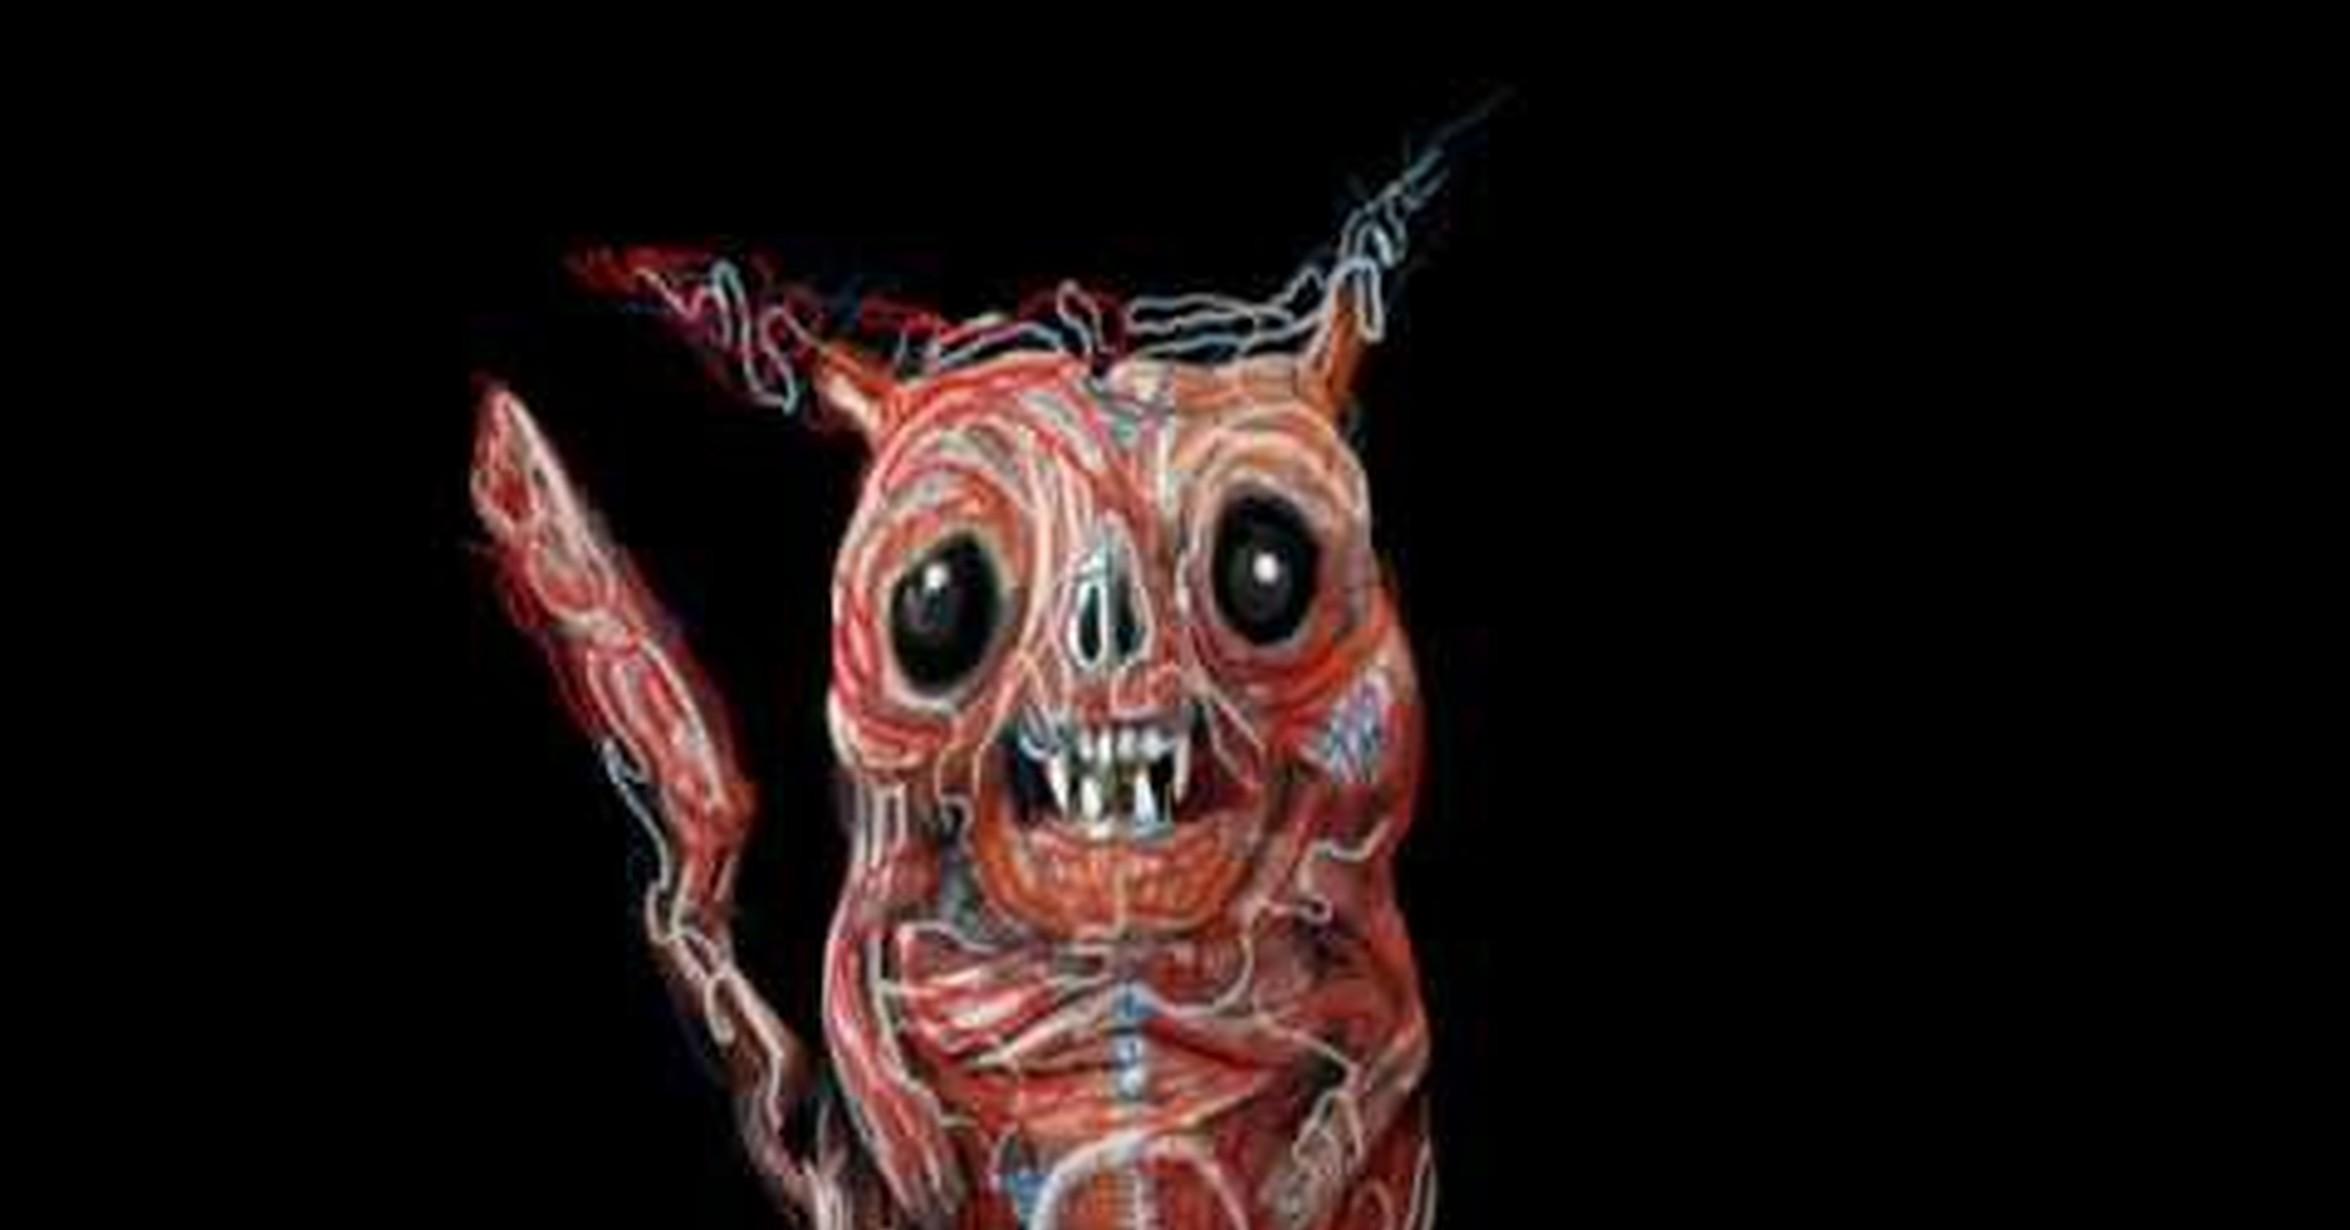 VRUTAL / Anatomía de un Pikachu (dibujando a pikachu desde dentro)